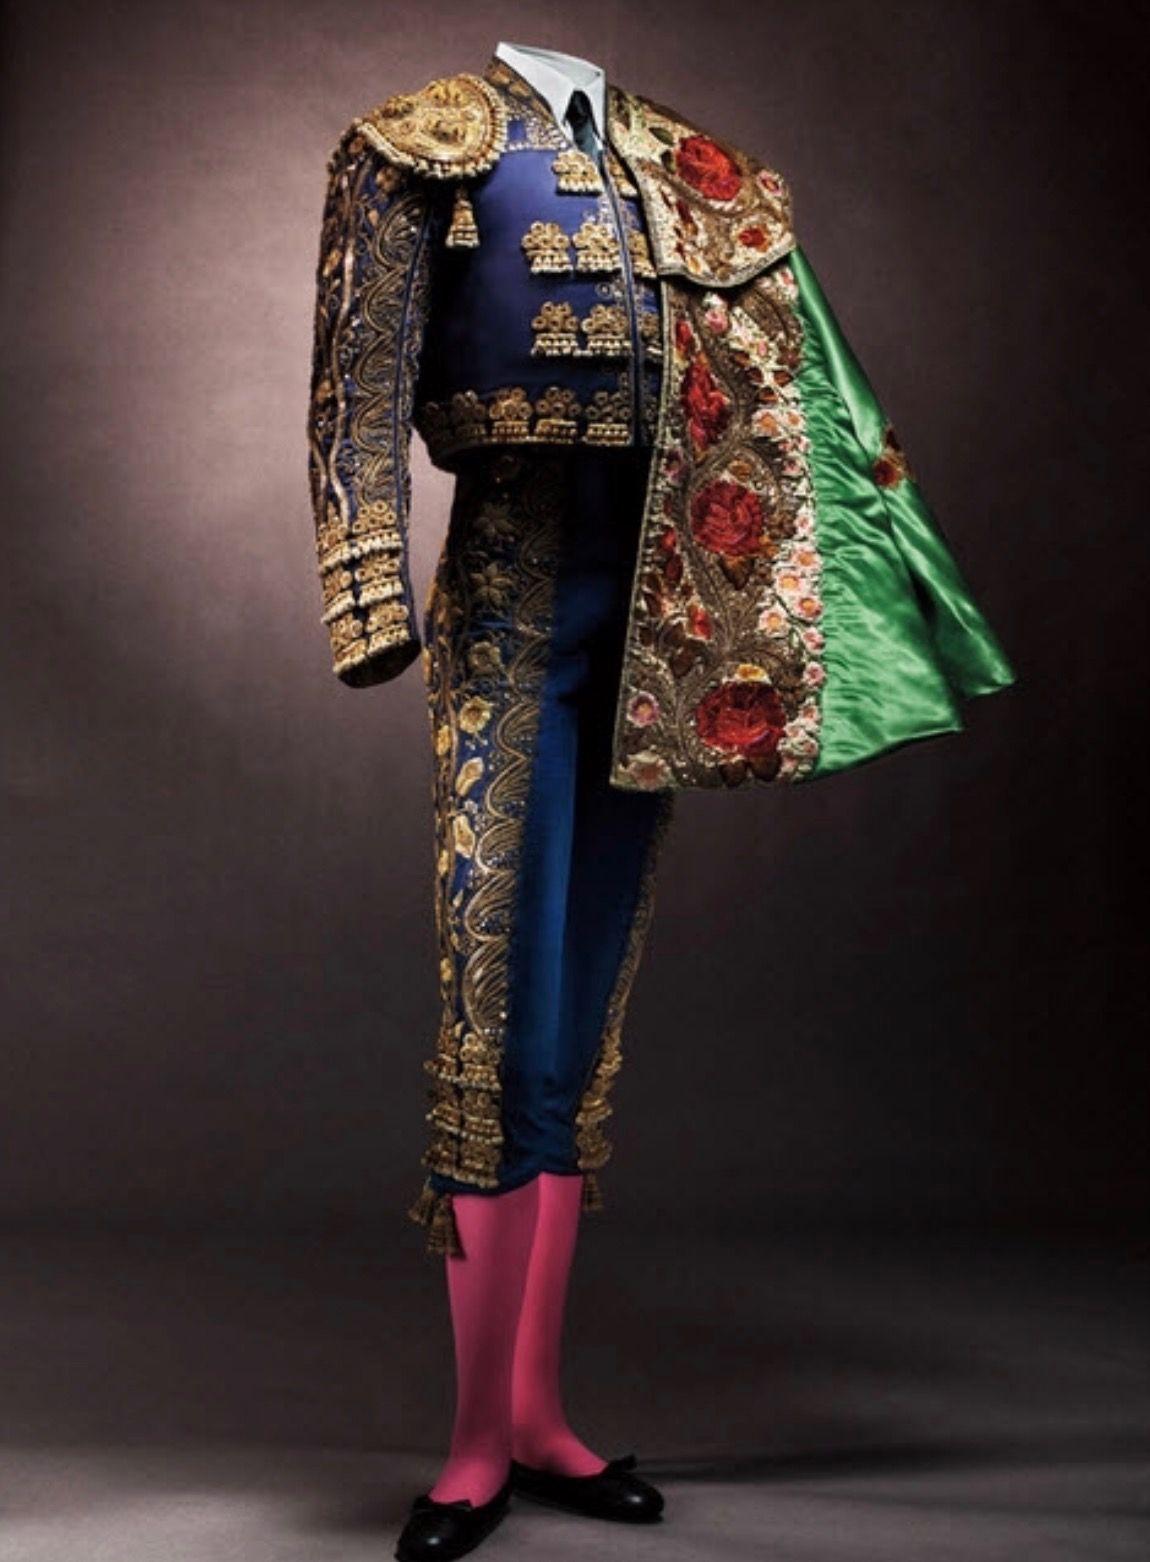 Bullfighter costume, 1950s   Traditional spanish clothing